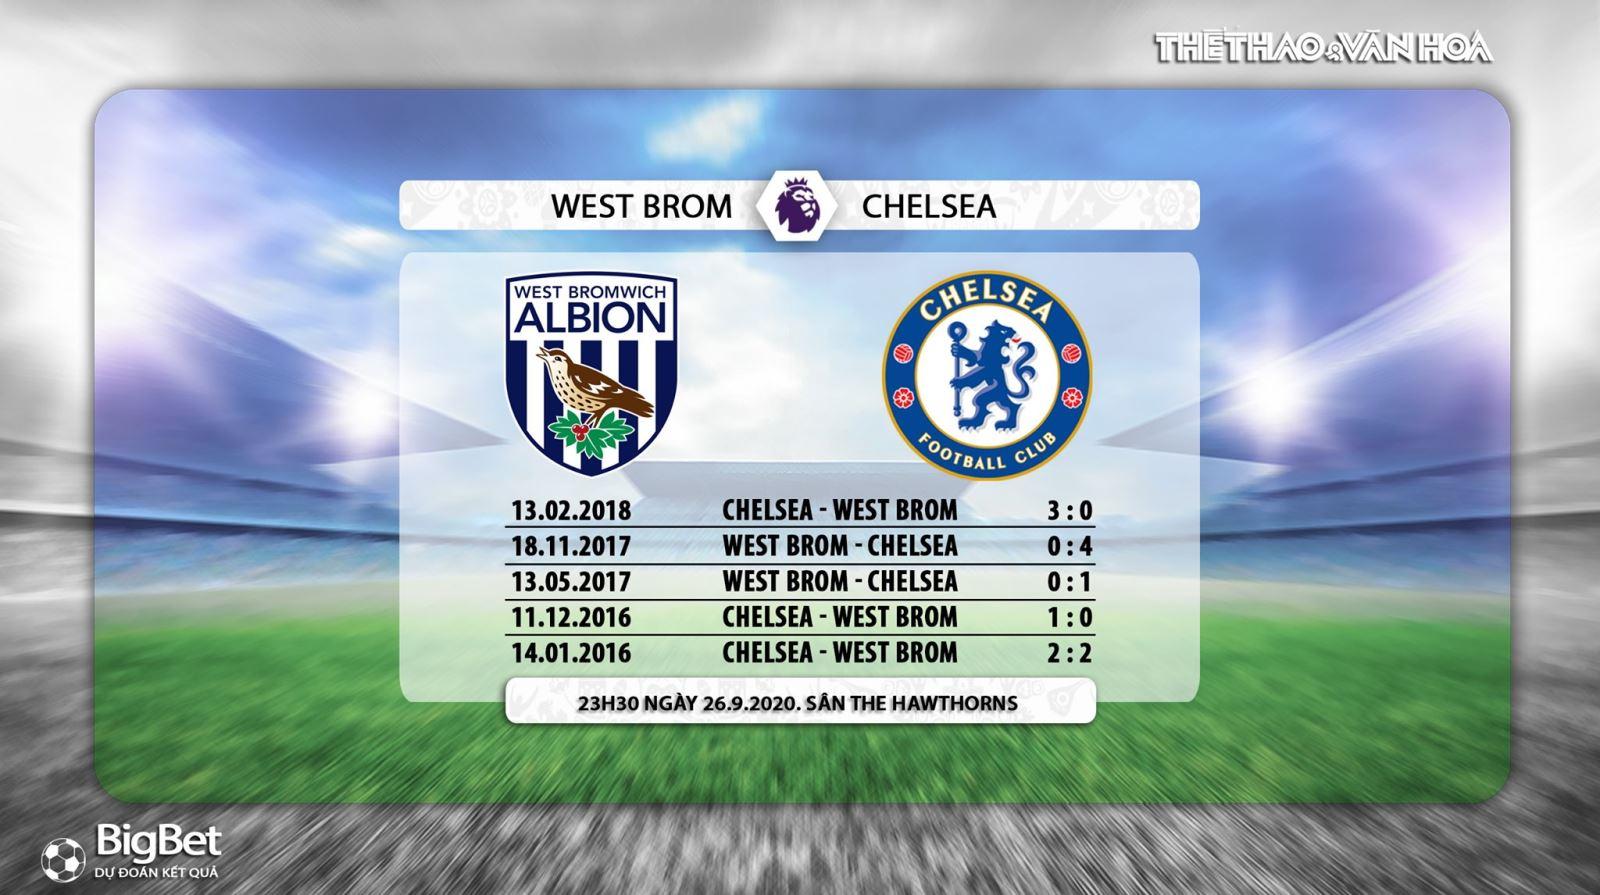 Soi kèo West Brom vs Chelsea, Chelsea, West Brom, nhận định West Brom vs Chelsea, soi kèo bóng đá West Brom vs Chelsea, nhận định West Brom vs Chelsea